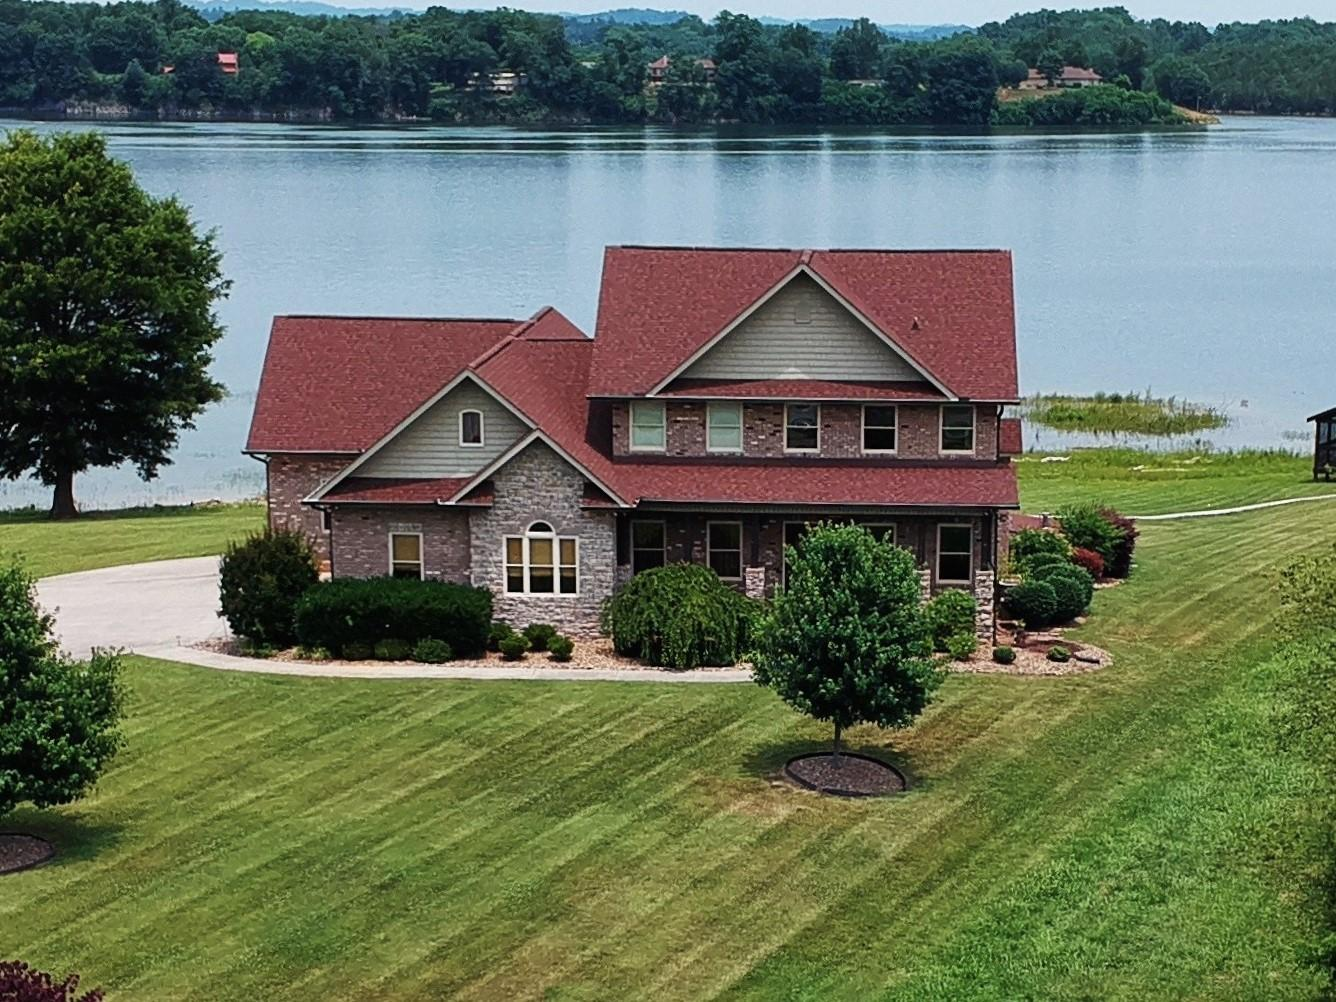 2356 Wild Pear Trail, Dandridge, Tennessee 37725, 3 Bedrooms Bedrooms, ,4 BathroomsBathrooms,Single Family,For Sale,Wild Pear Trail,1095529